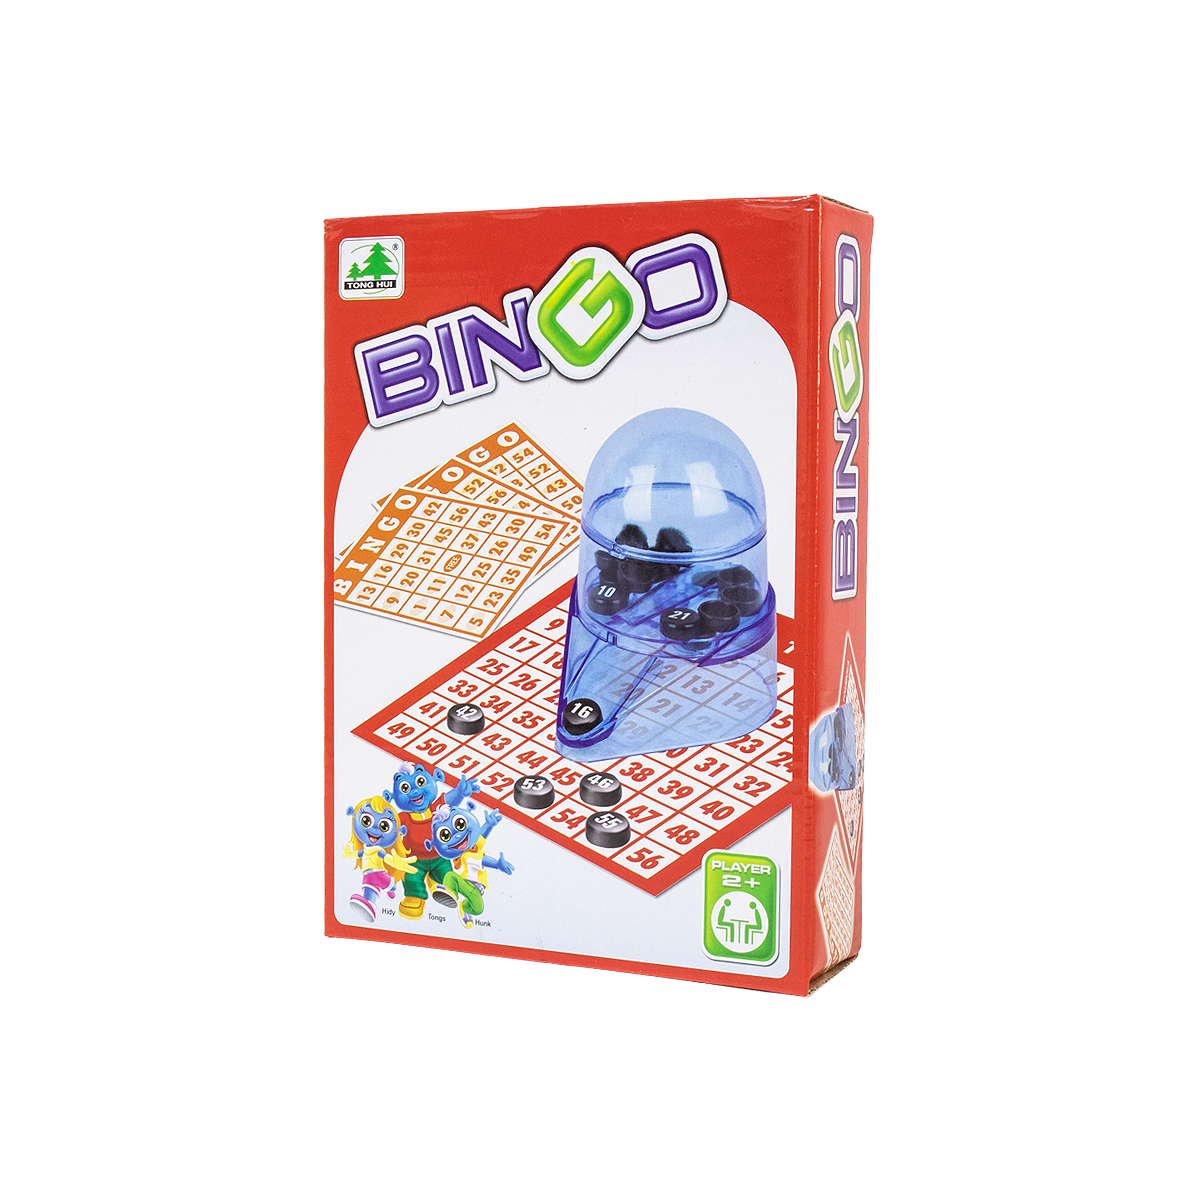 JOGO DO BINGO